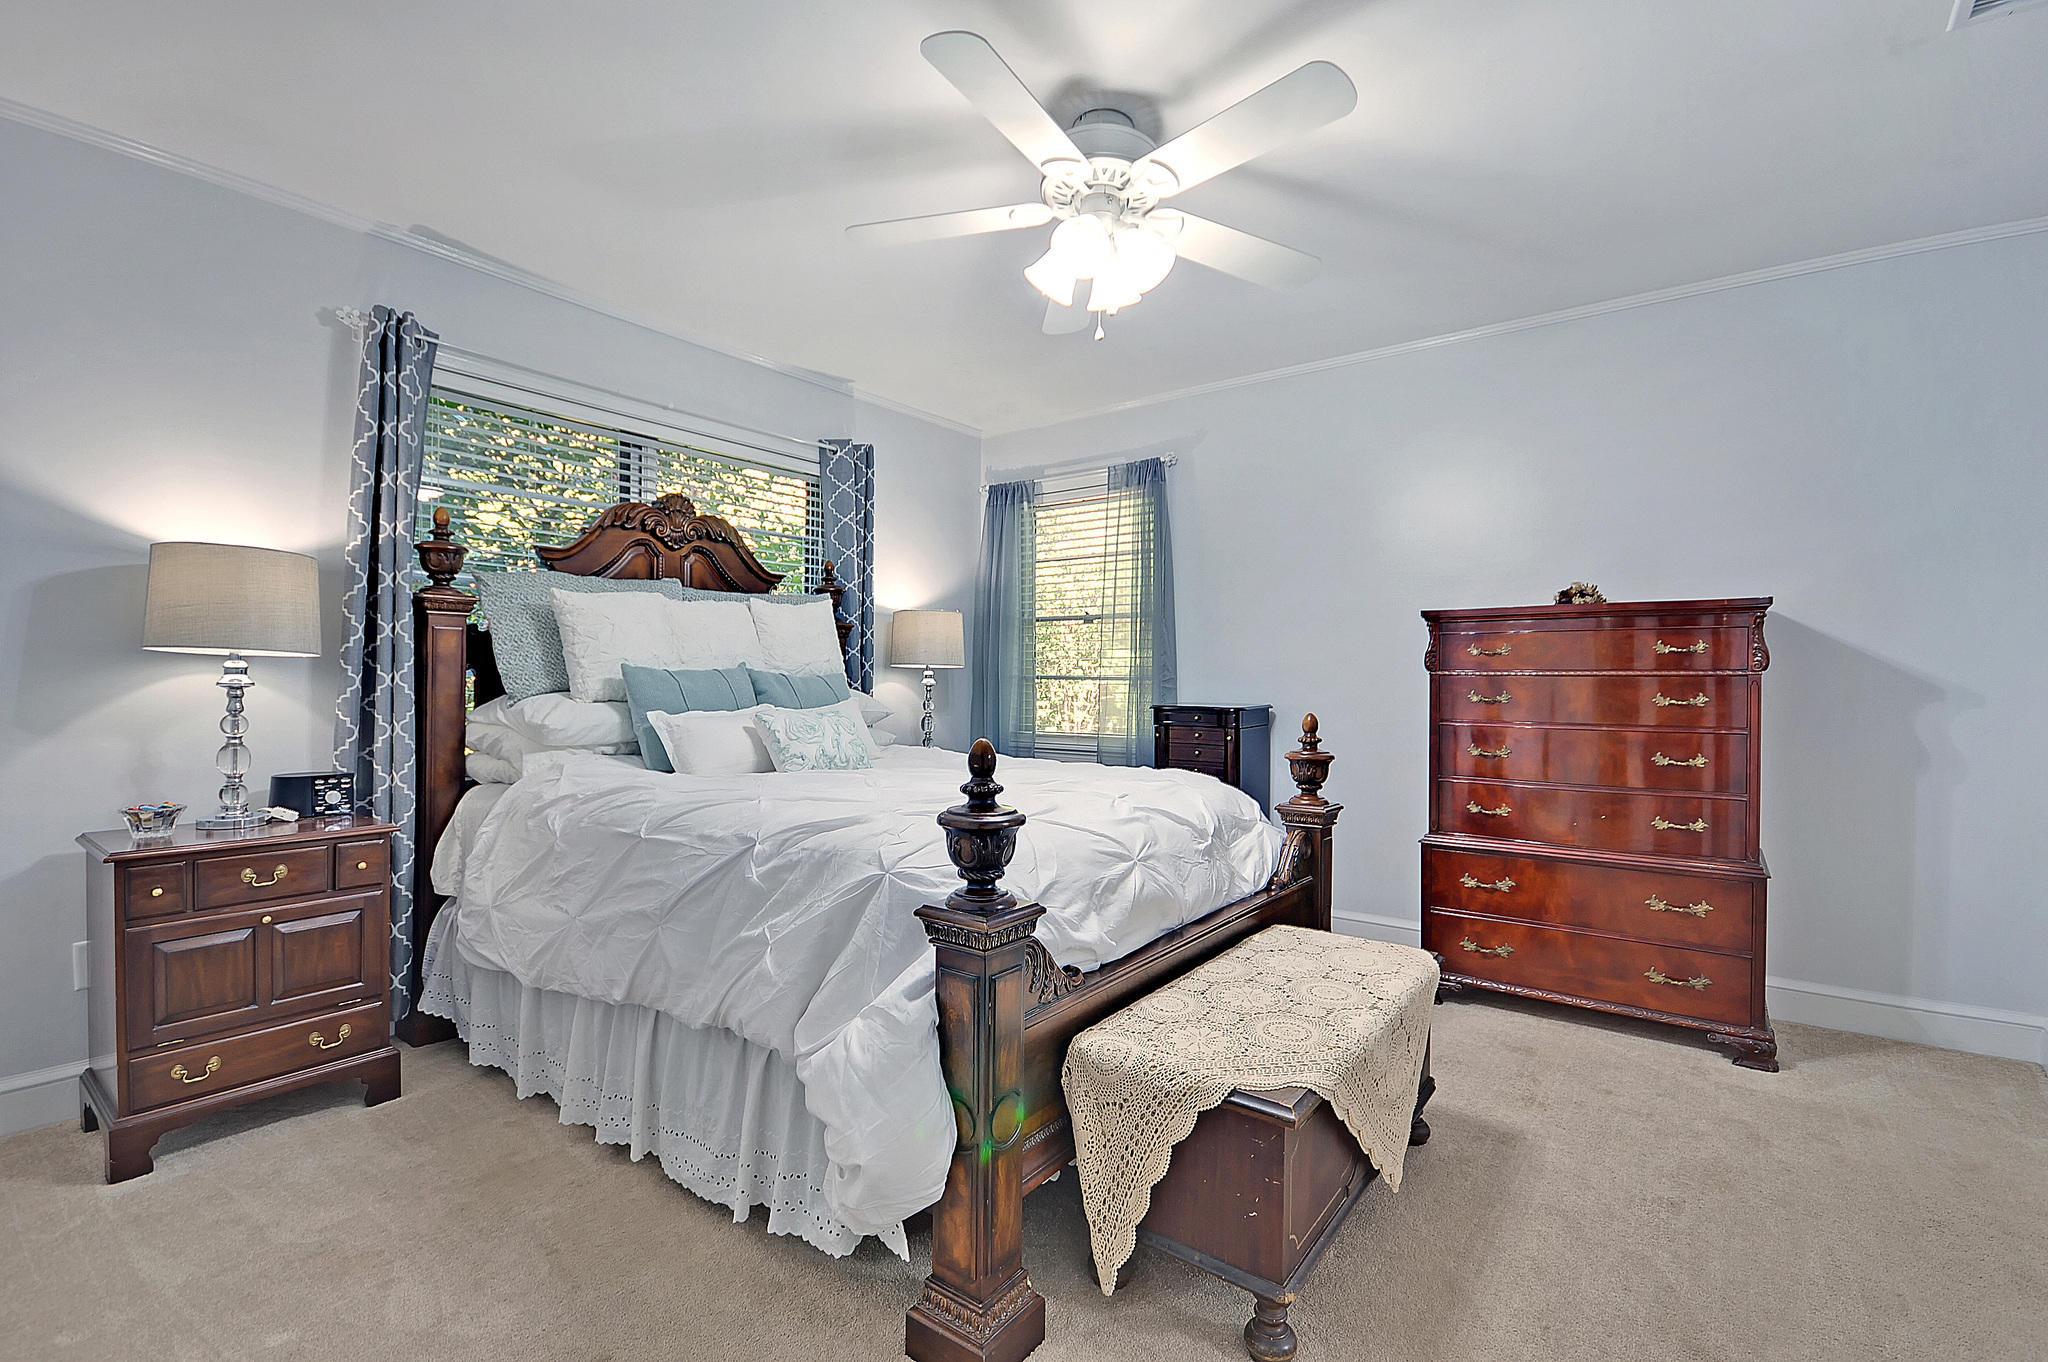 Edgewater Park Homes For Sale - 1356 Emory, Charleston, SC - 38